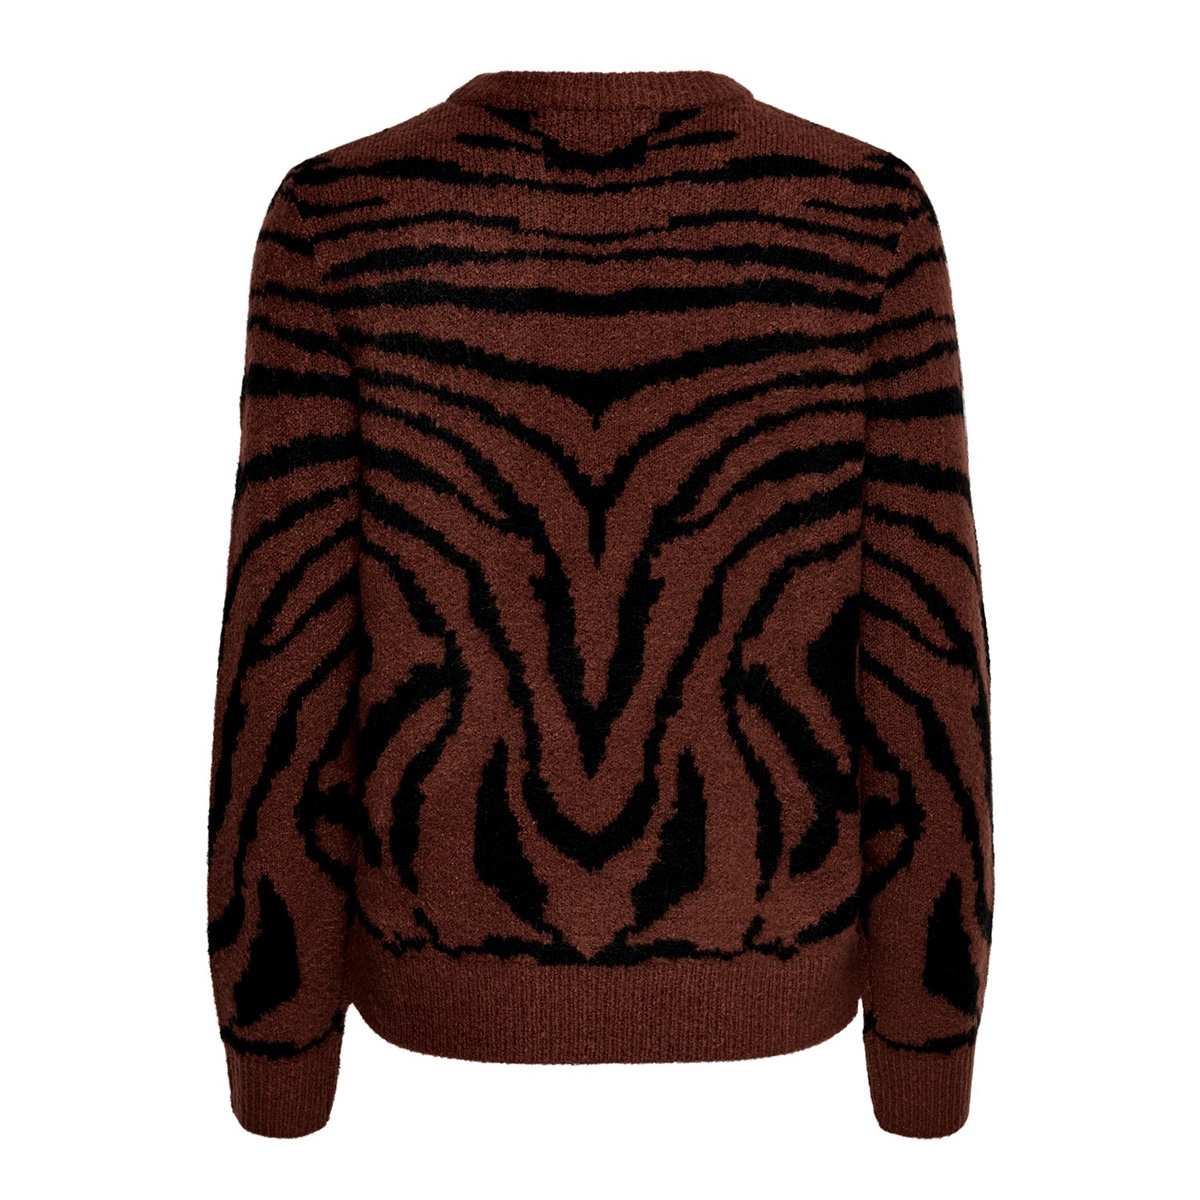 jdyalicia l/s jaquard pullover knt 15190294 jacqueline de yong trui cinnamon/w. black